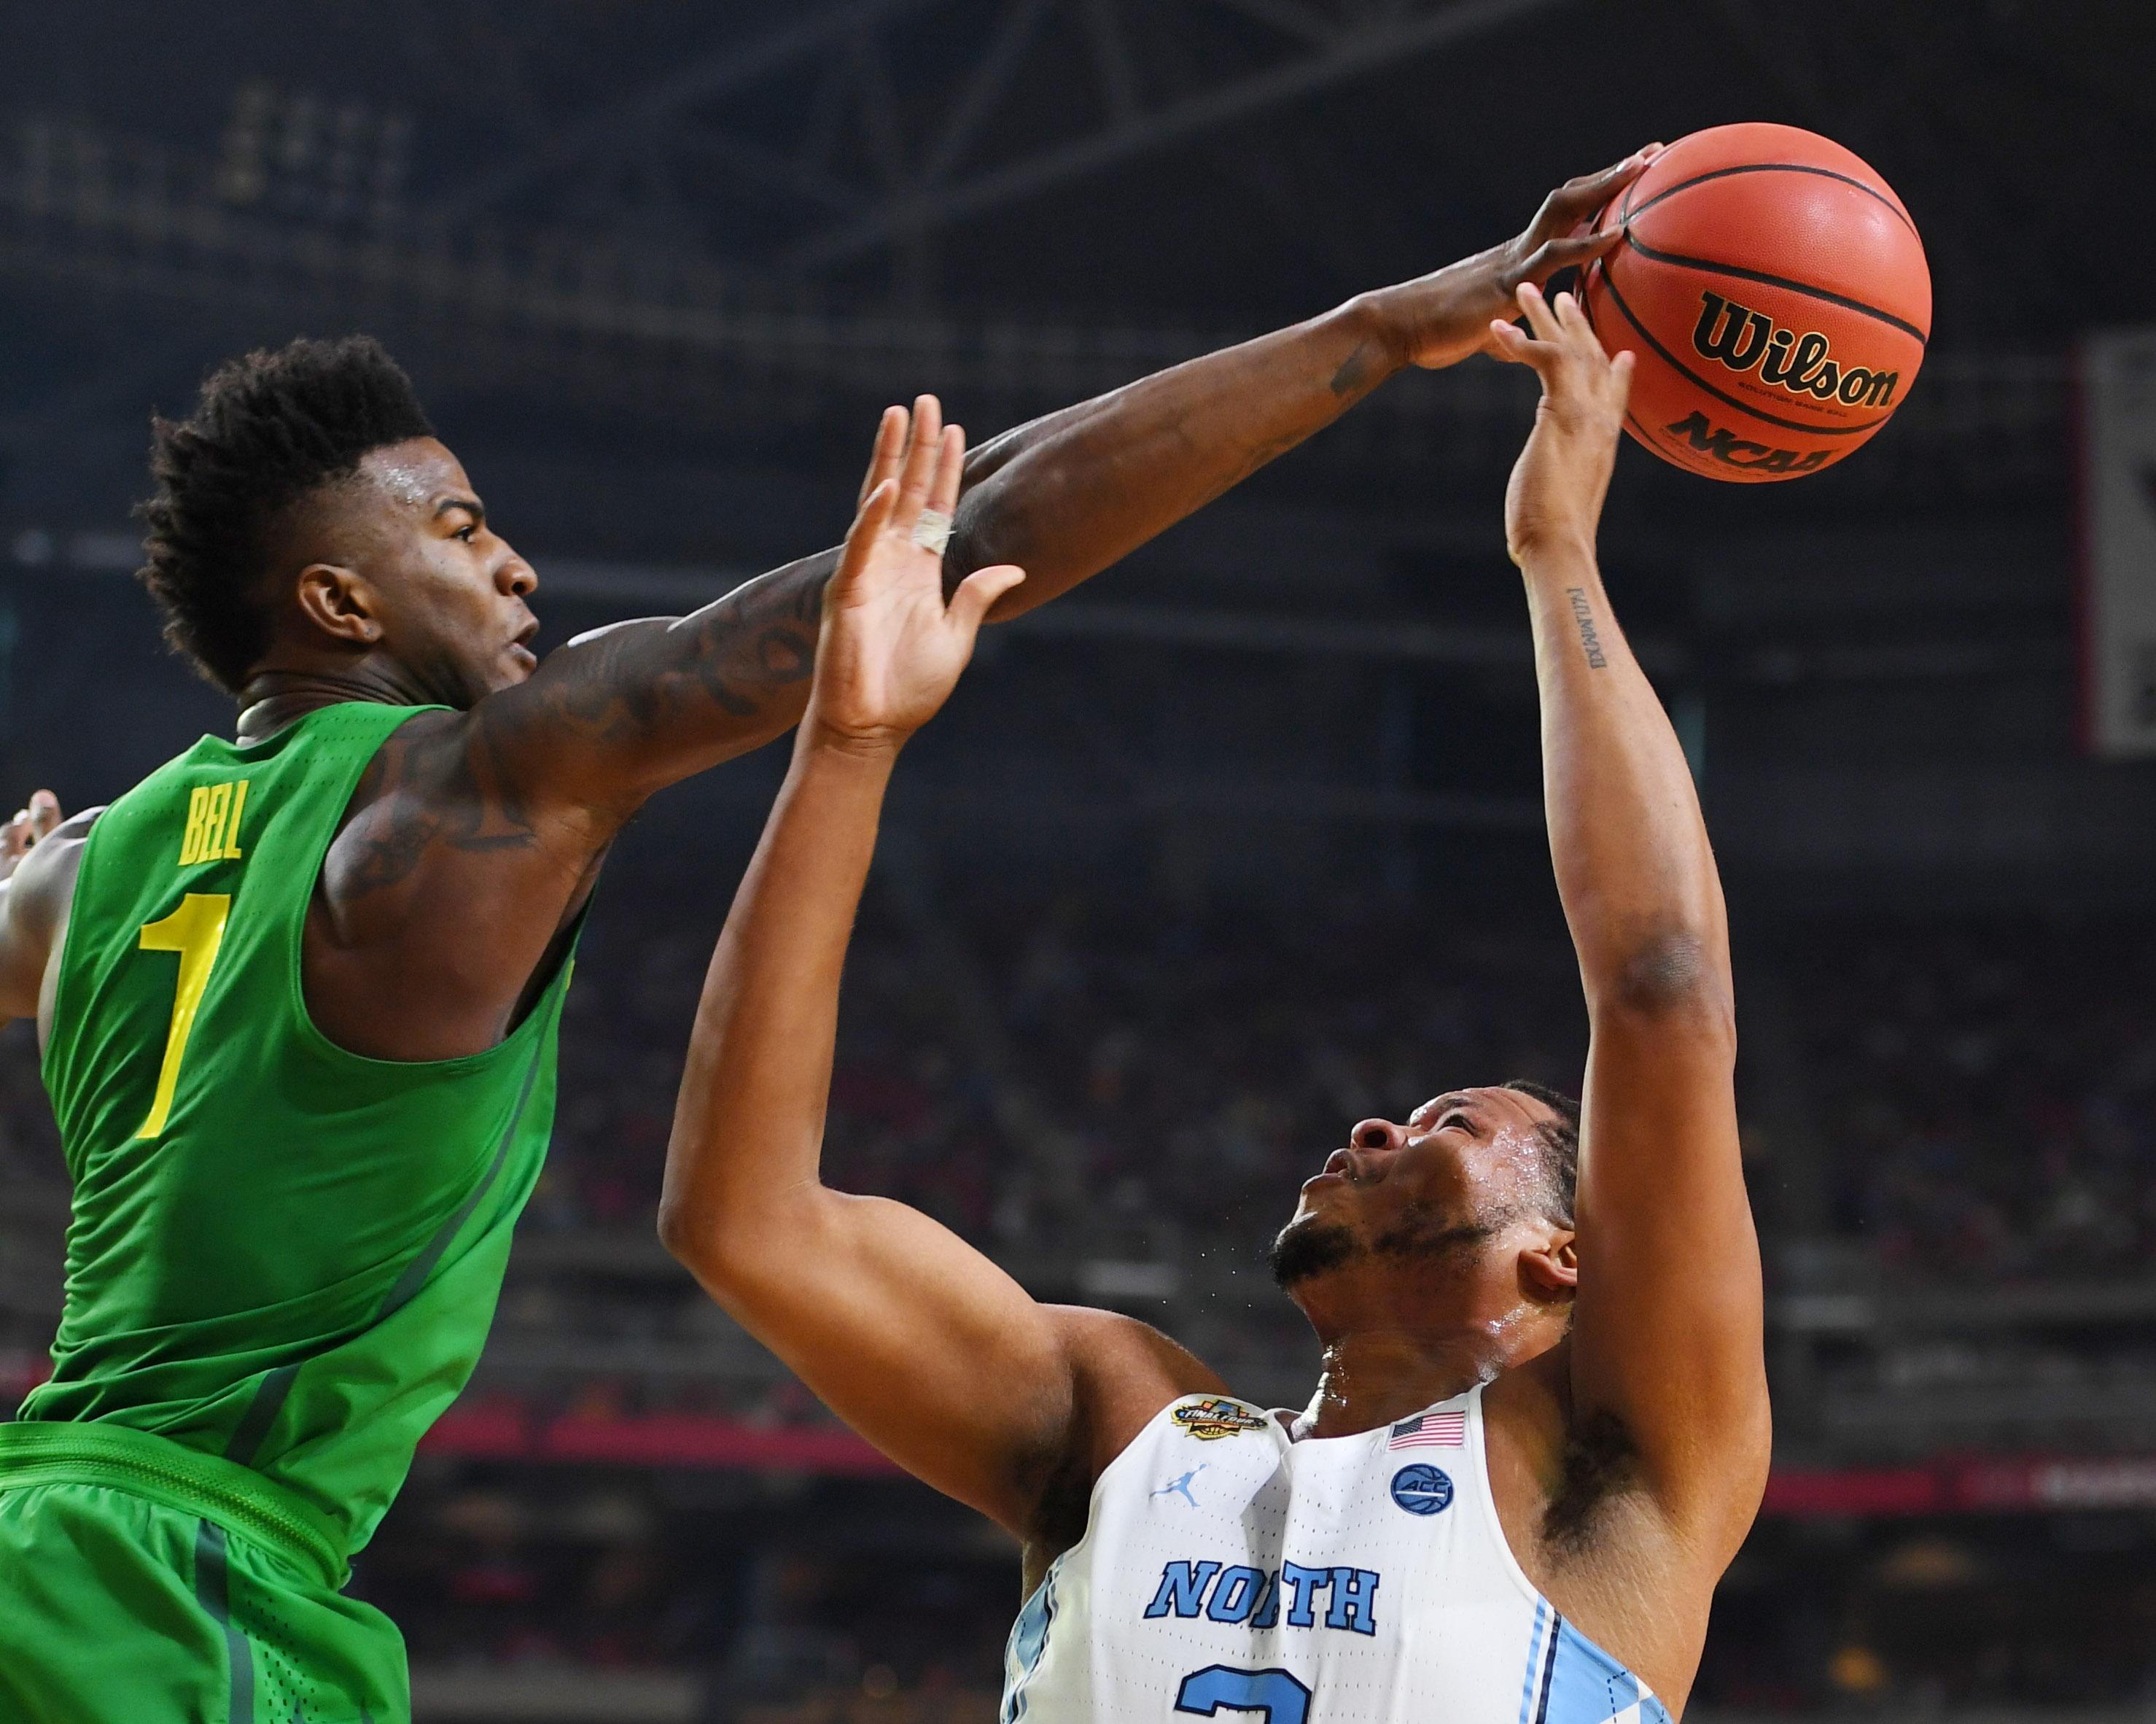 9986174-ncaa-basketball-final-four-oregon-vs-north-carolina